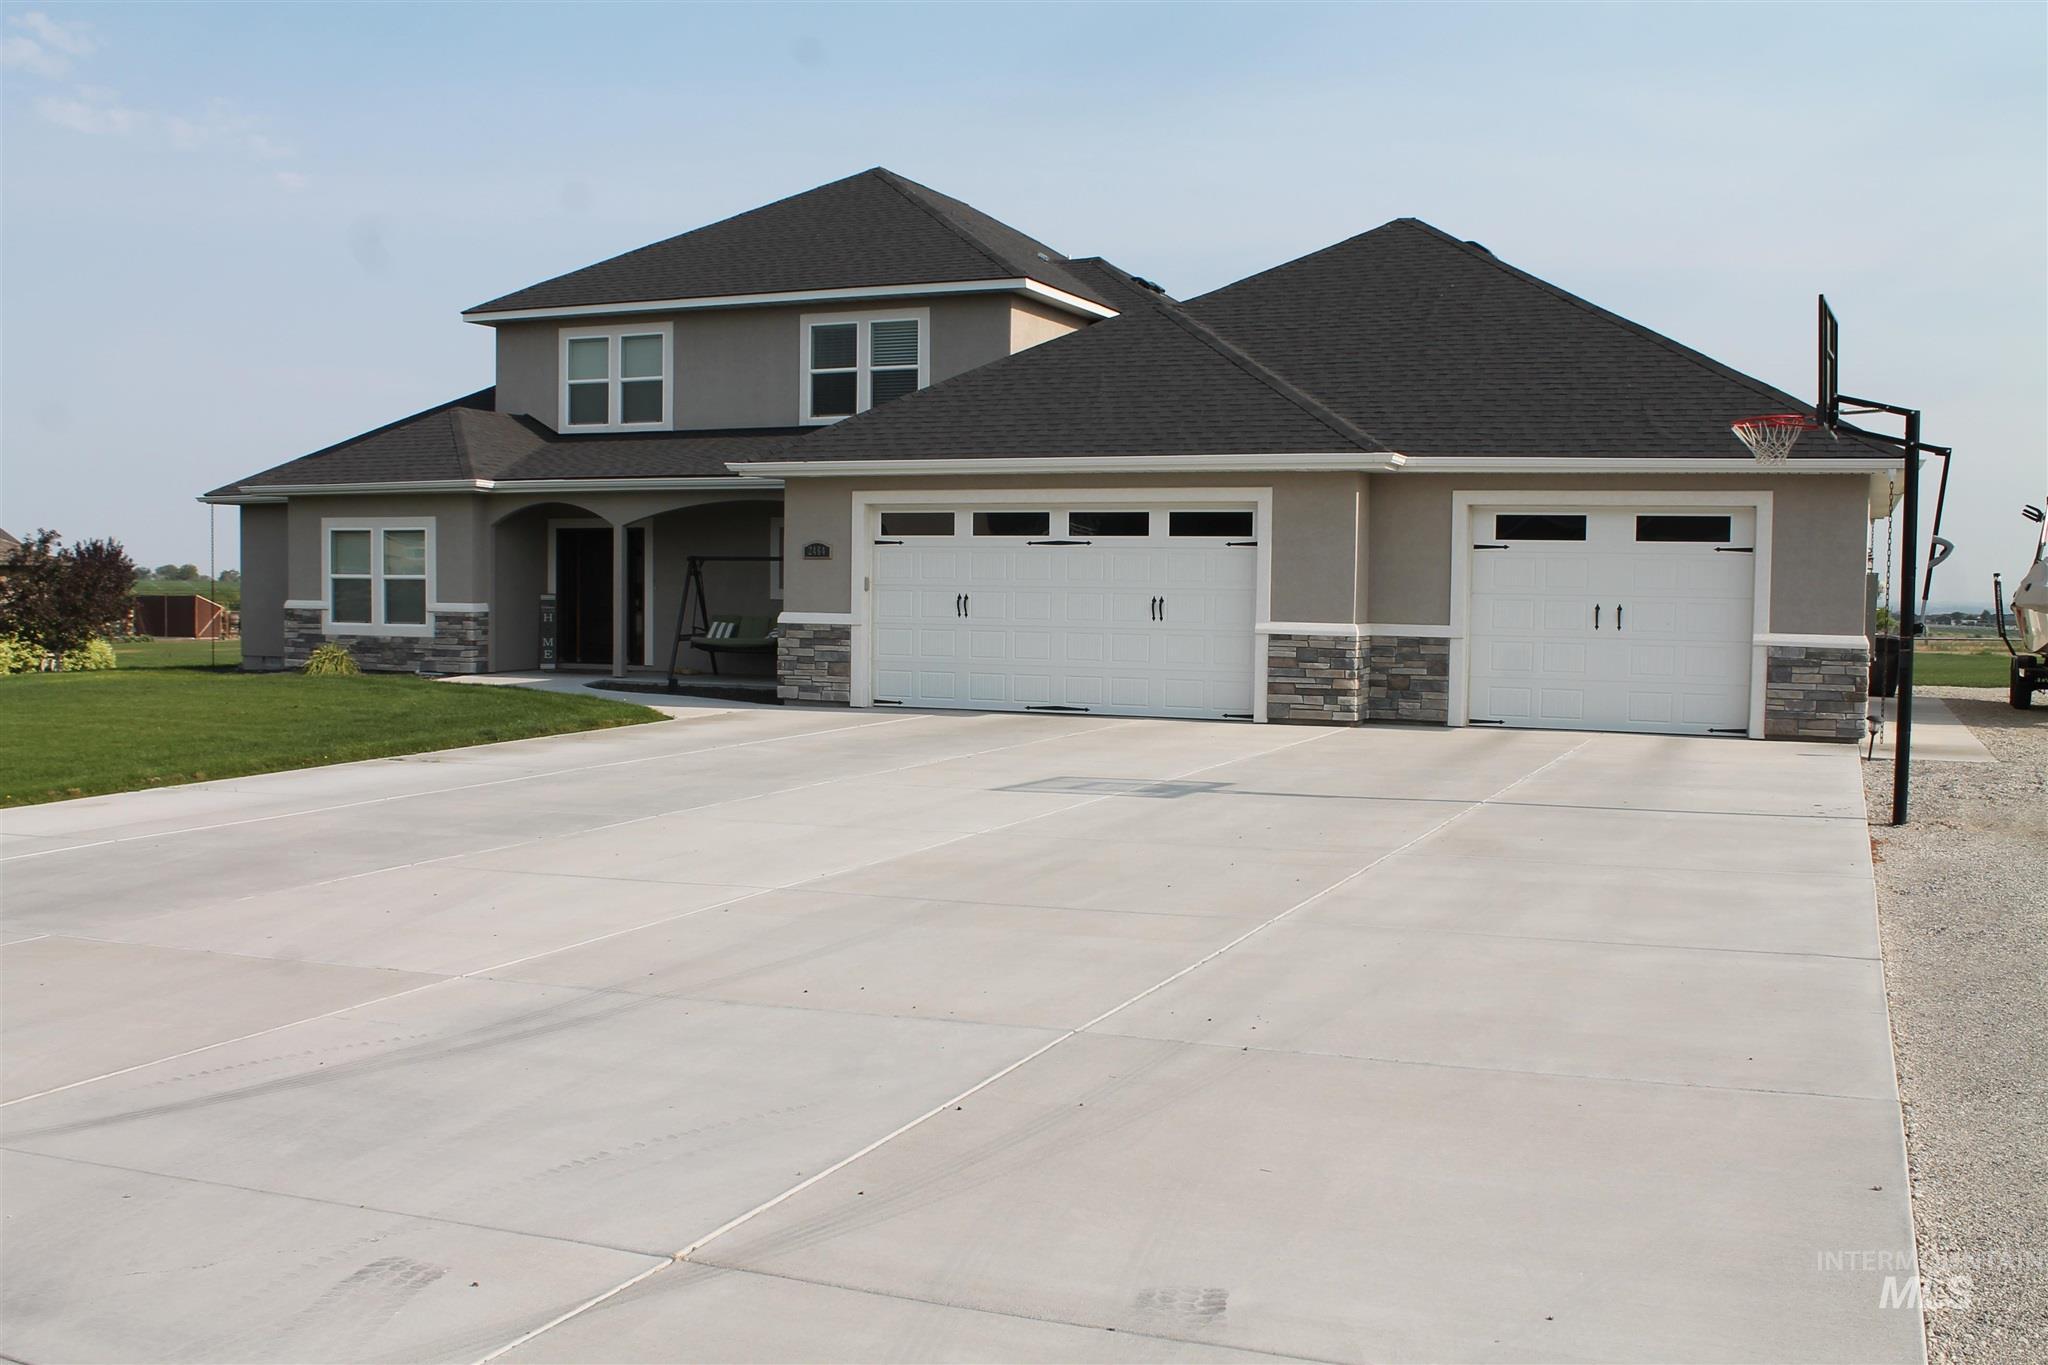 2464 E 3719 N Property Photo 1